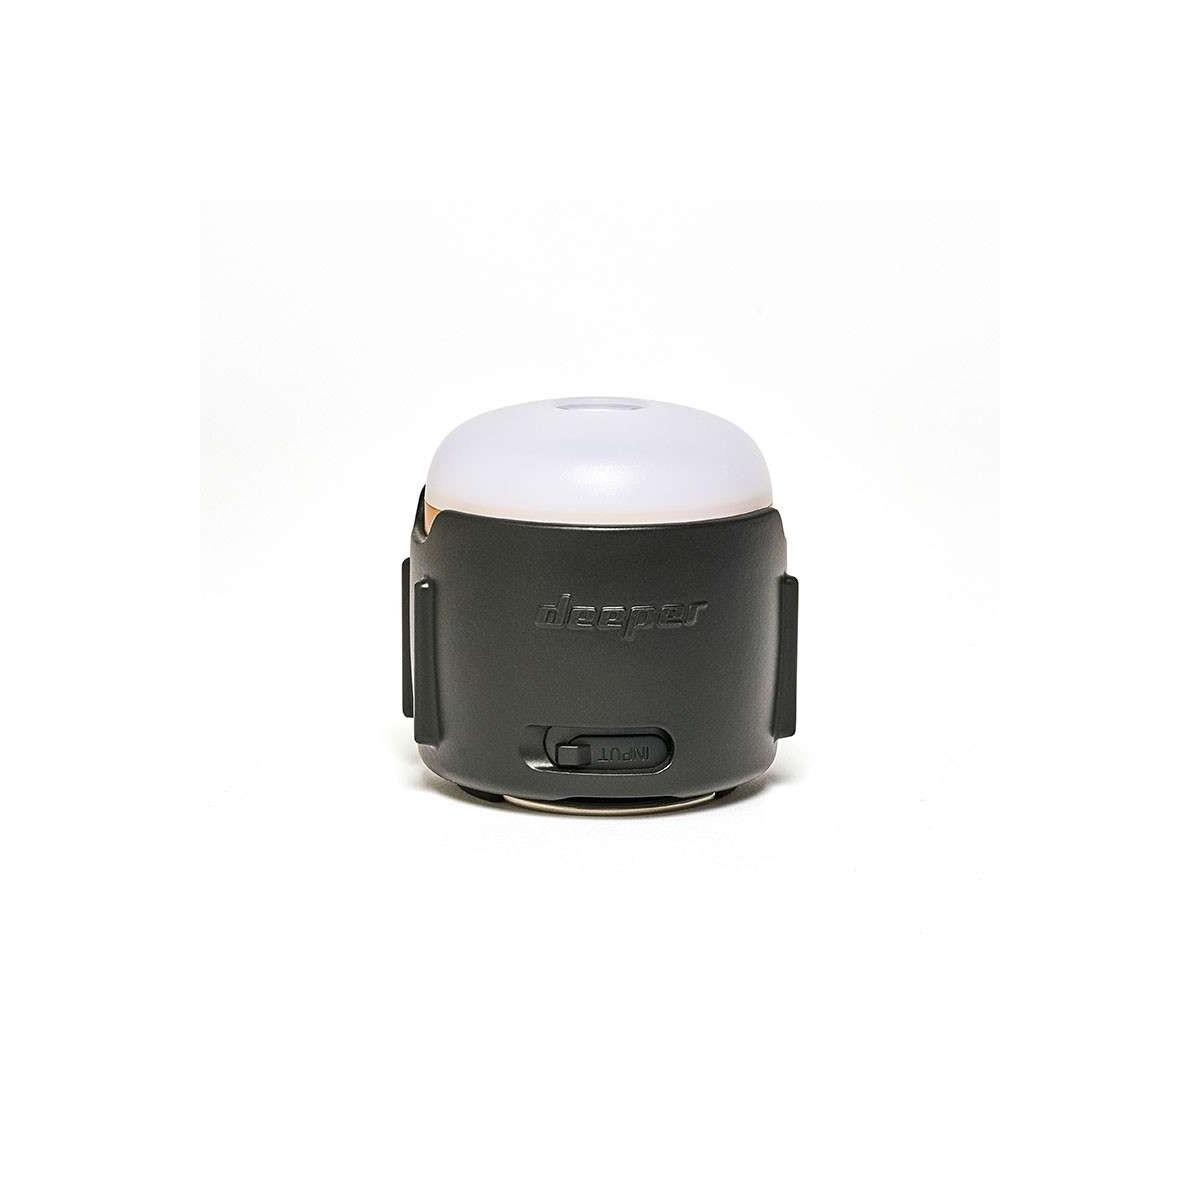 Lanterne Deeper Power Lantern avec chargeur USB